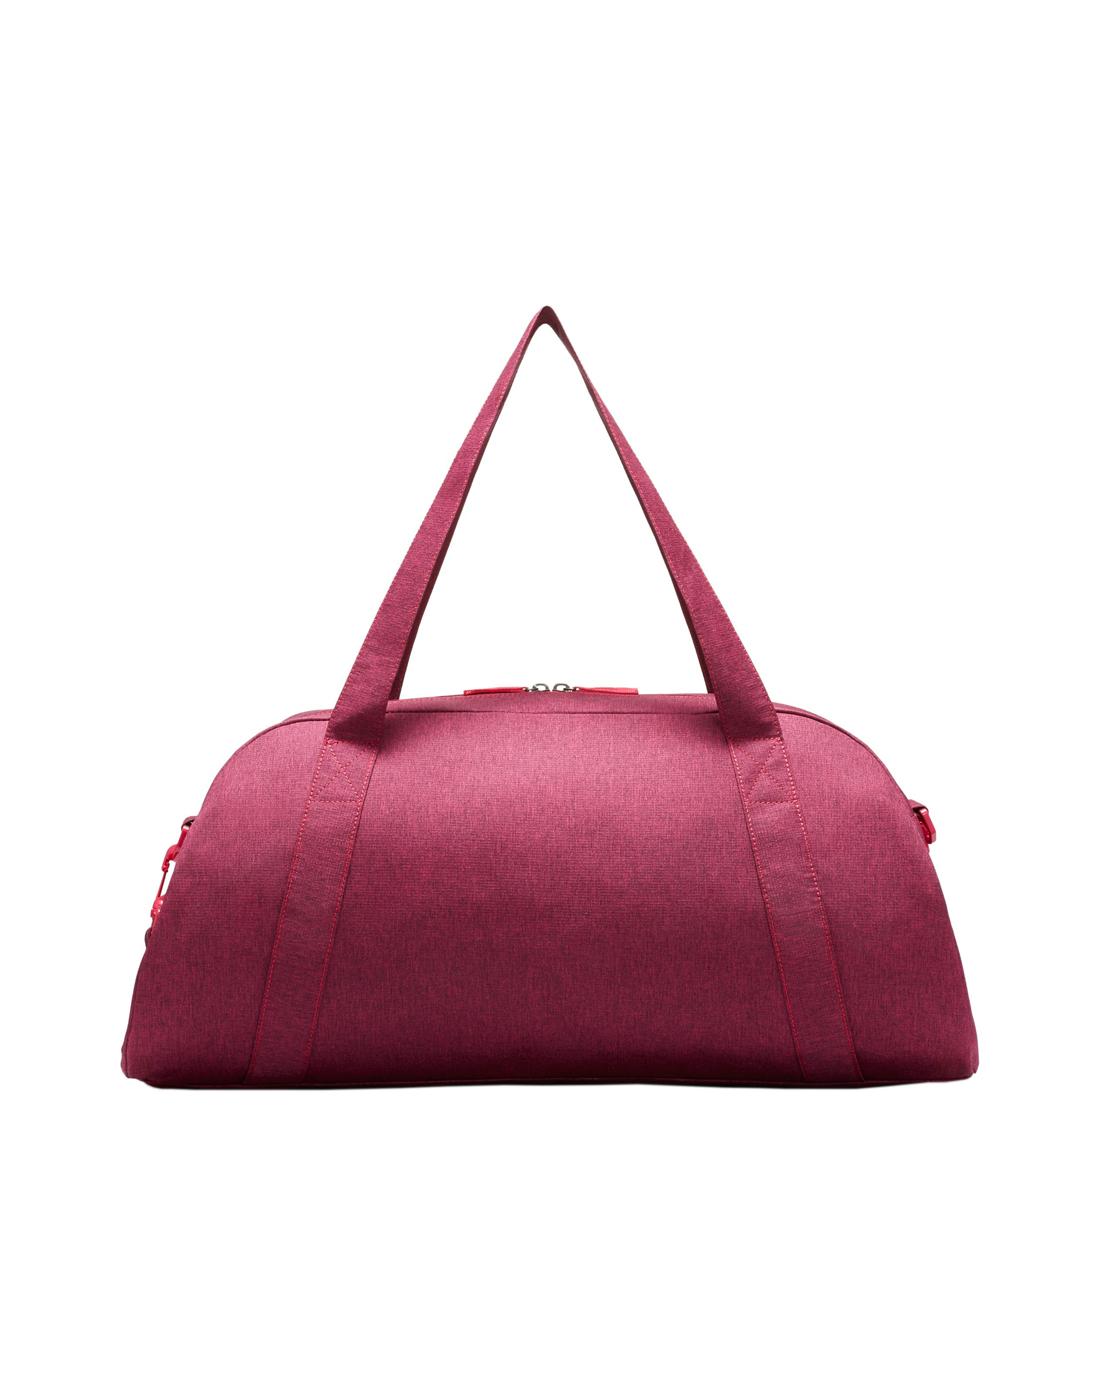 329908140c Nike Brasilia X Small Duffle Bag